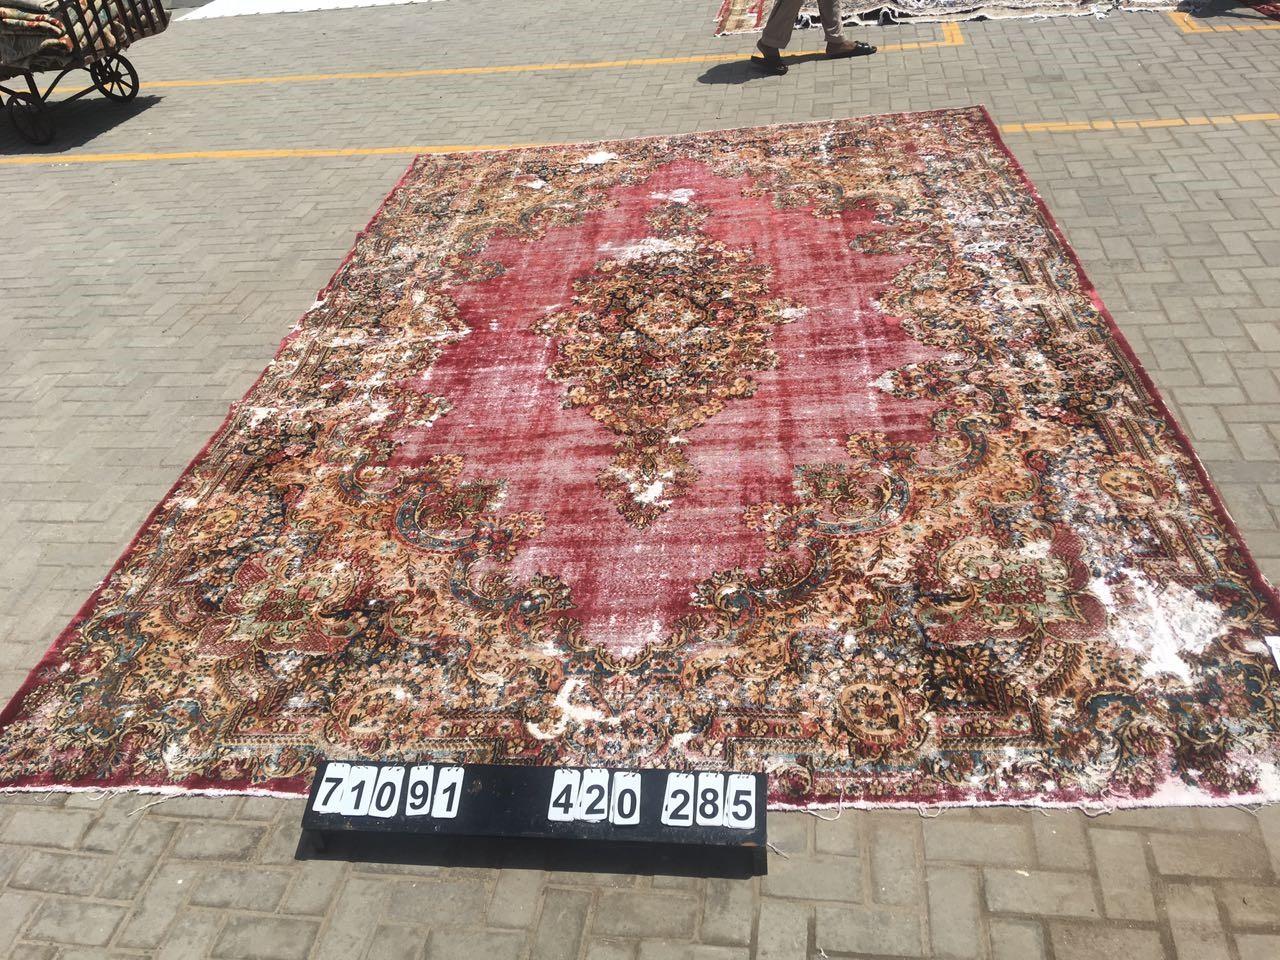 Vintage vloerkleed rood 420cm x 285cm nr71091